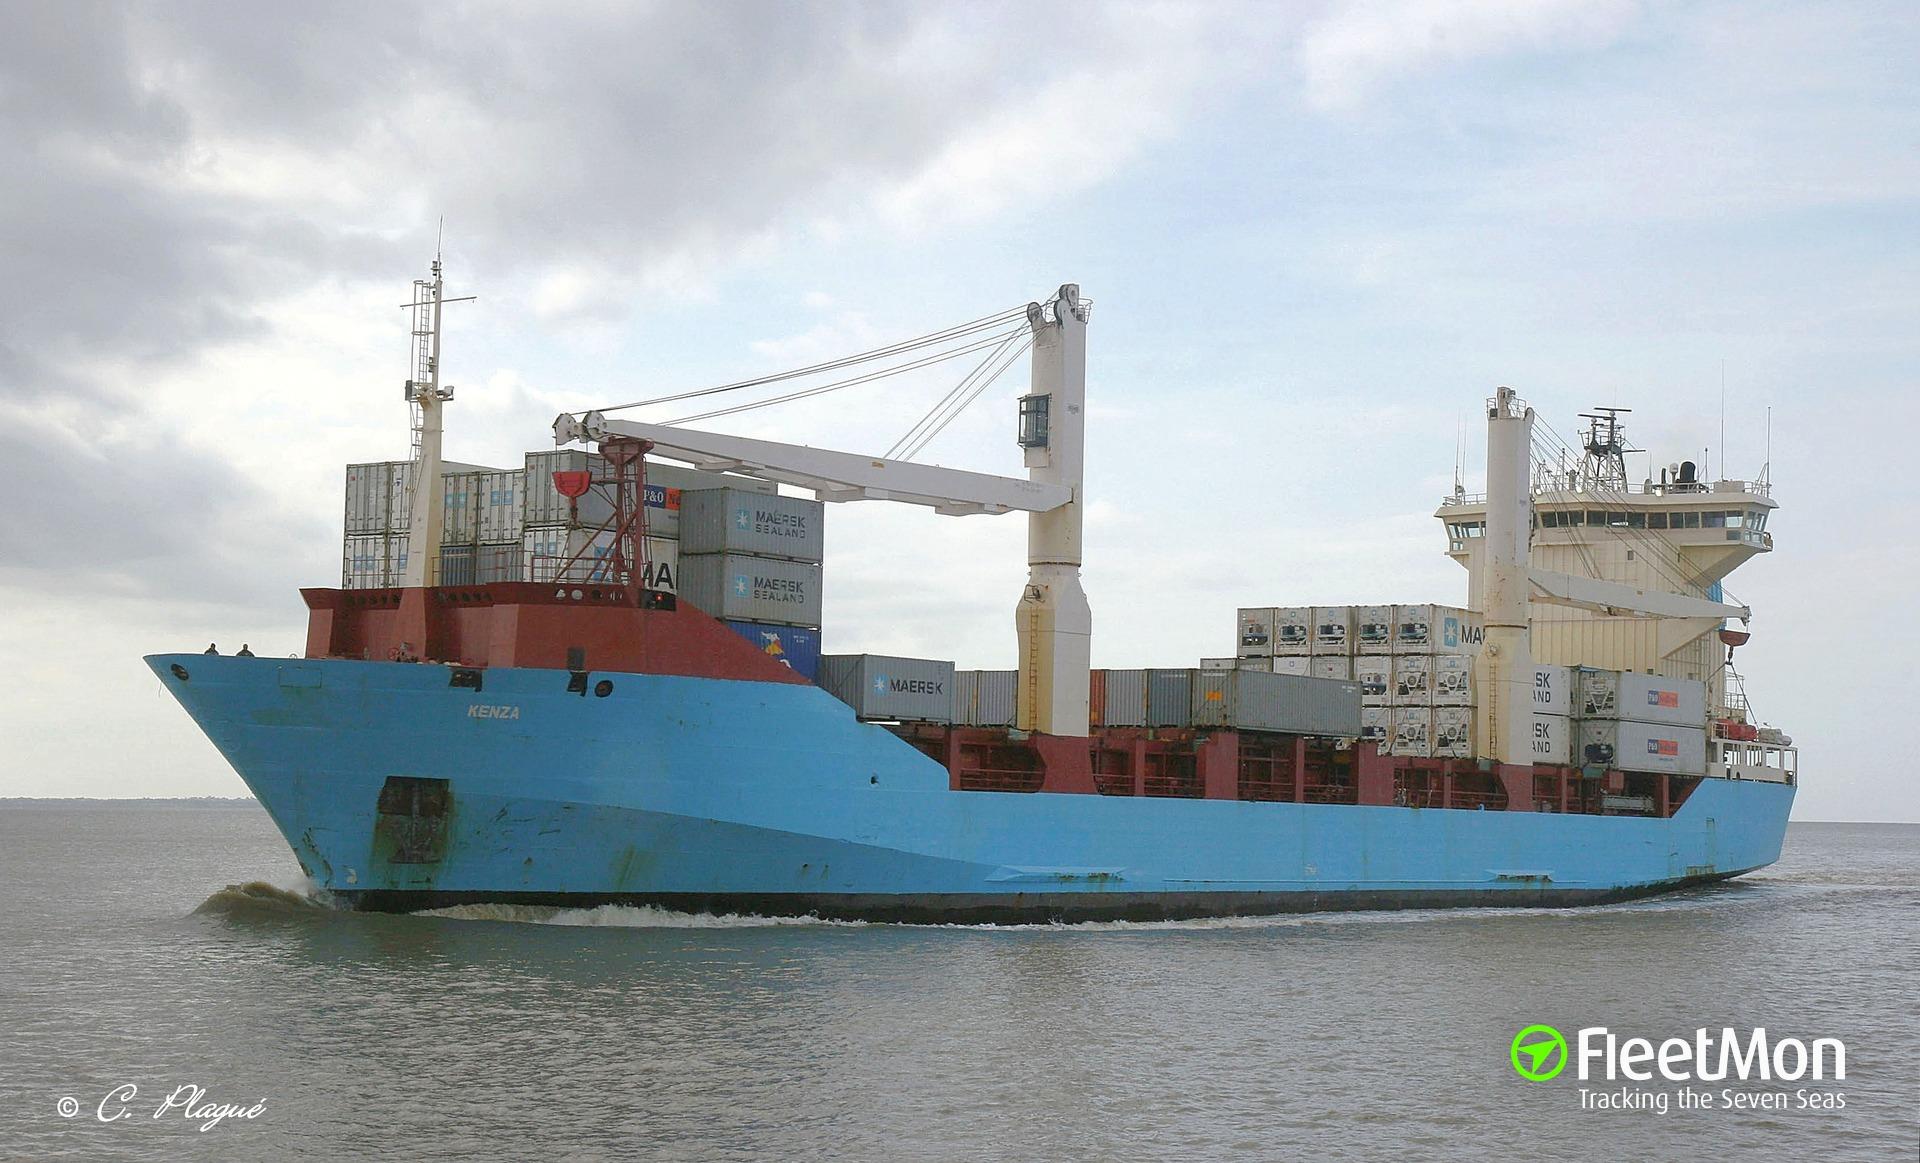 Orca 2 Container Ship Imo 8914544